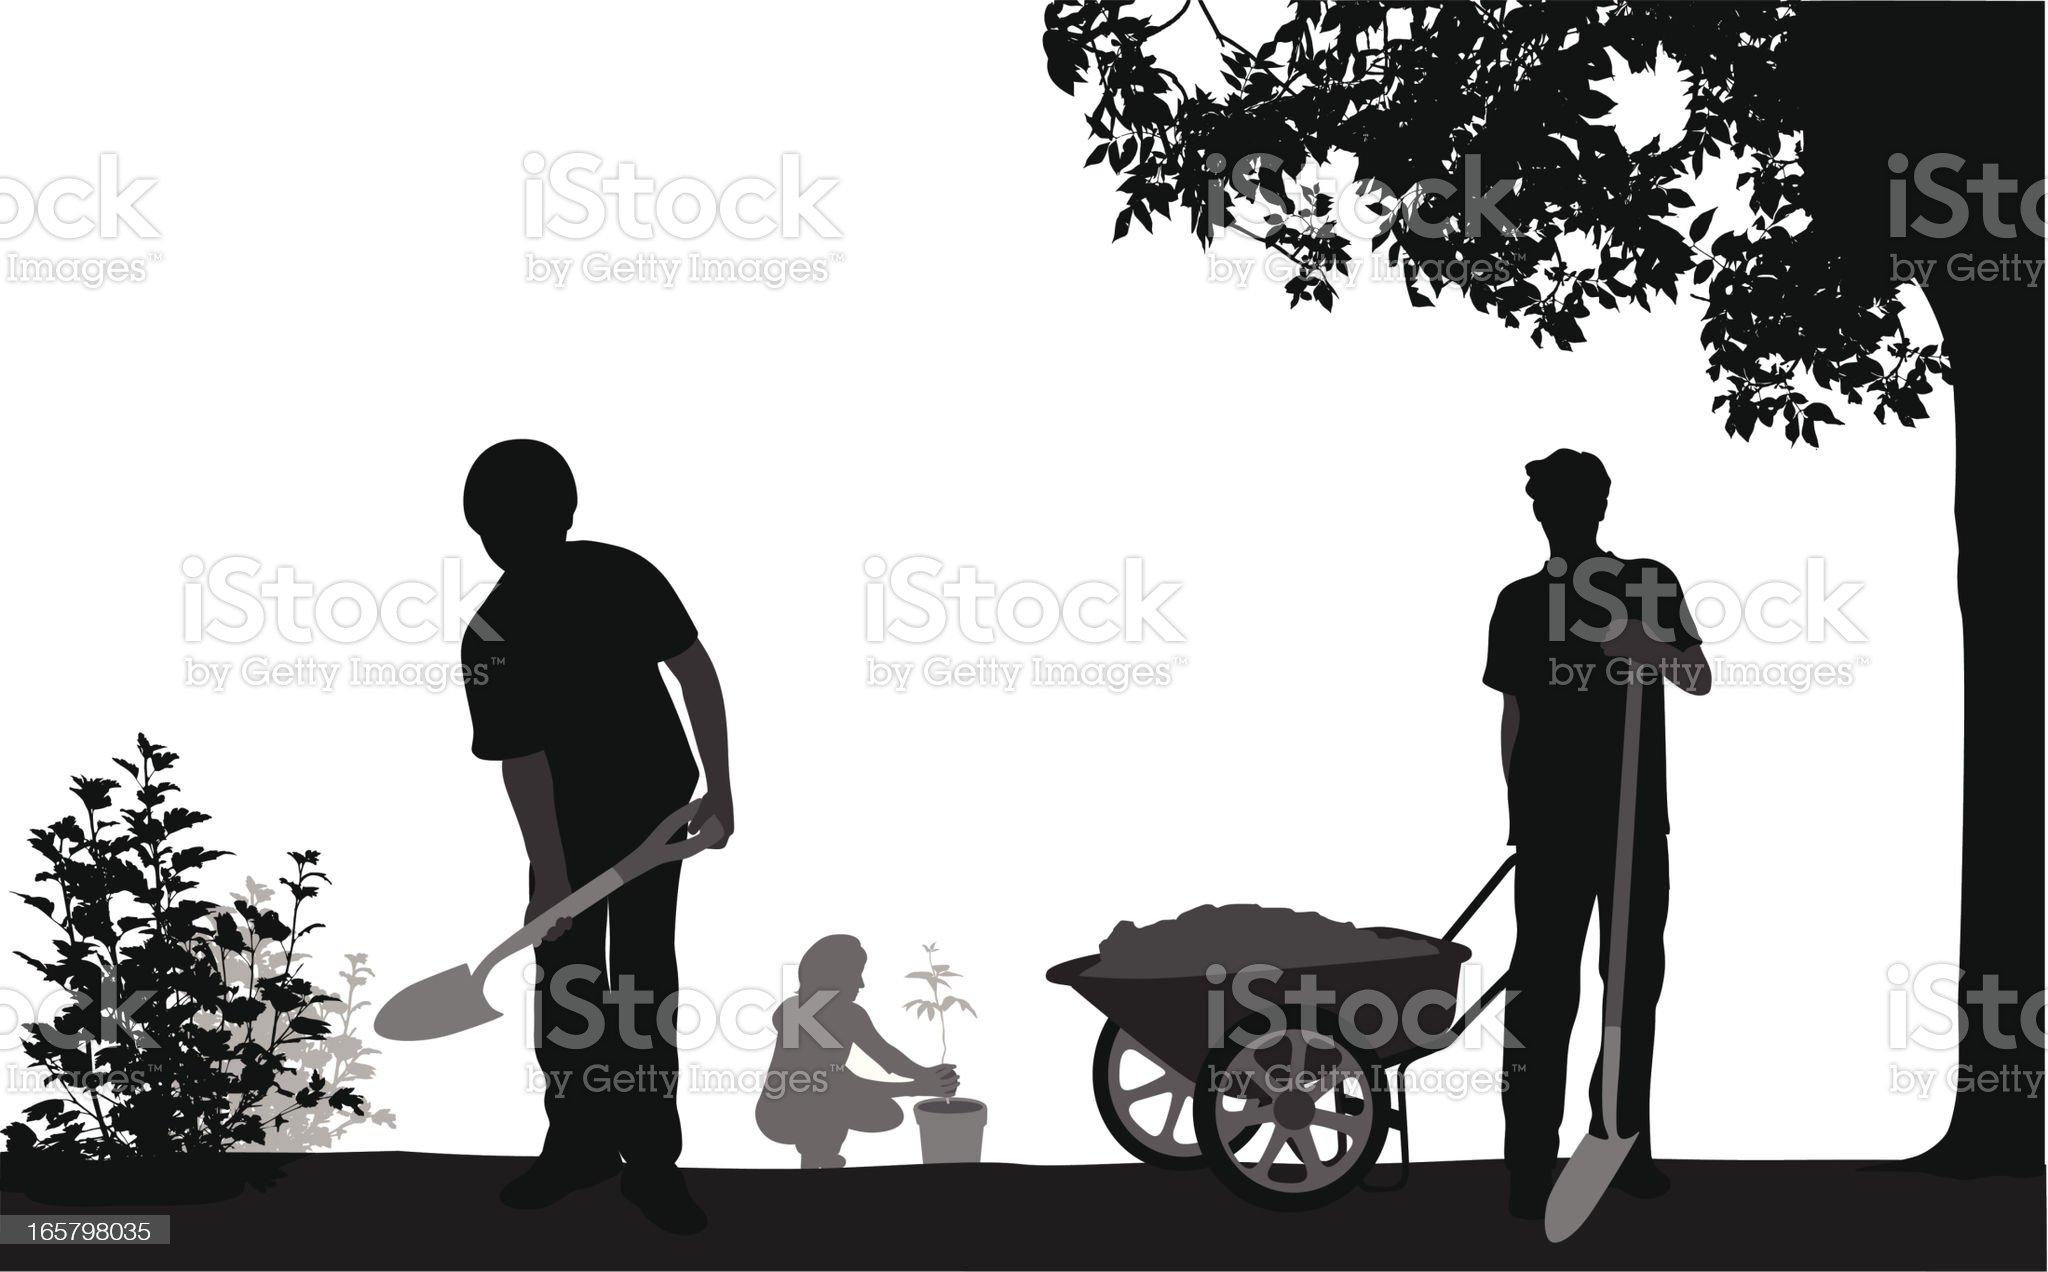 Family'n Gardening Vector Silhouette royalty-free stock vector art